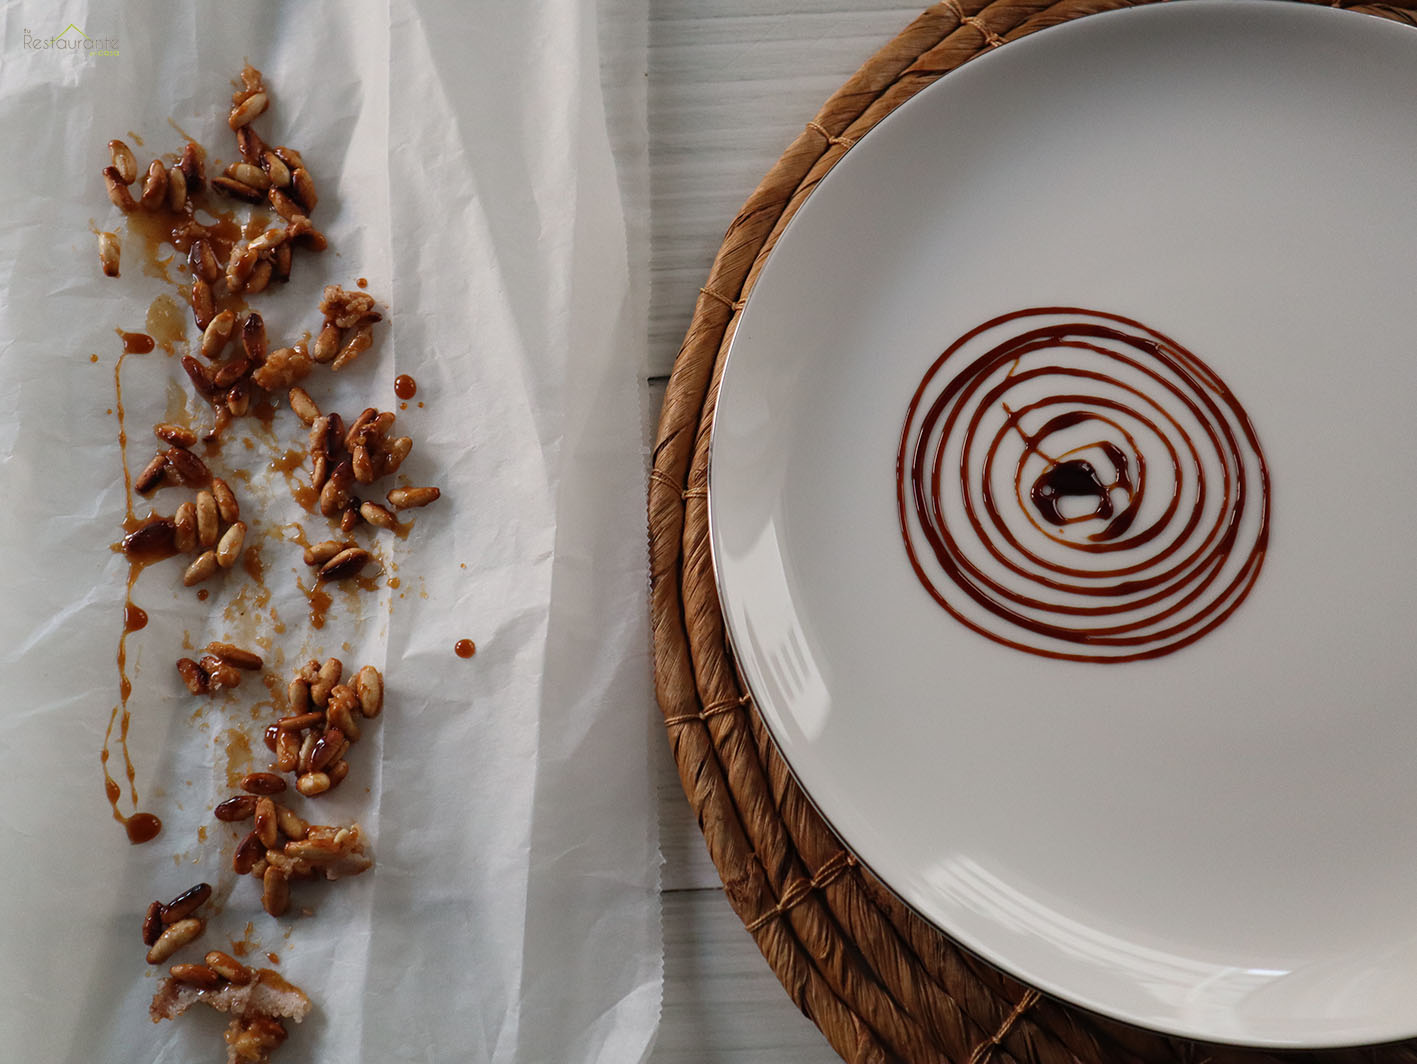 piñones caramelizados - tu restaurante en casa